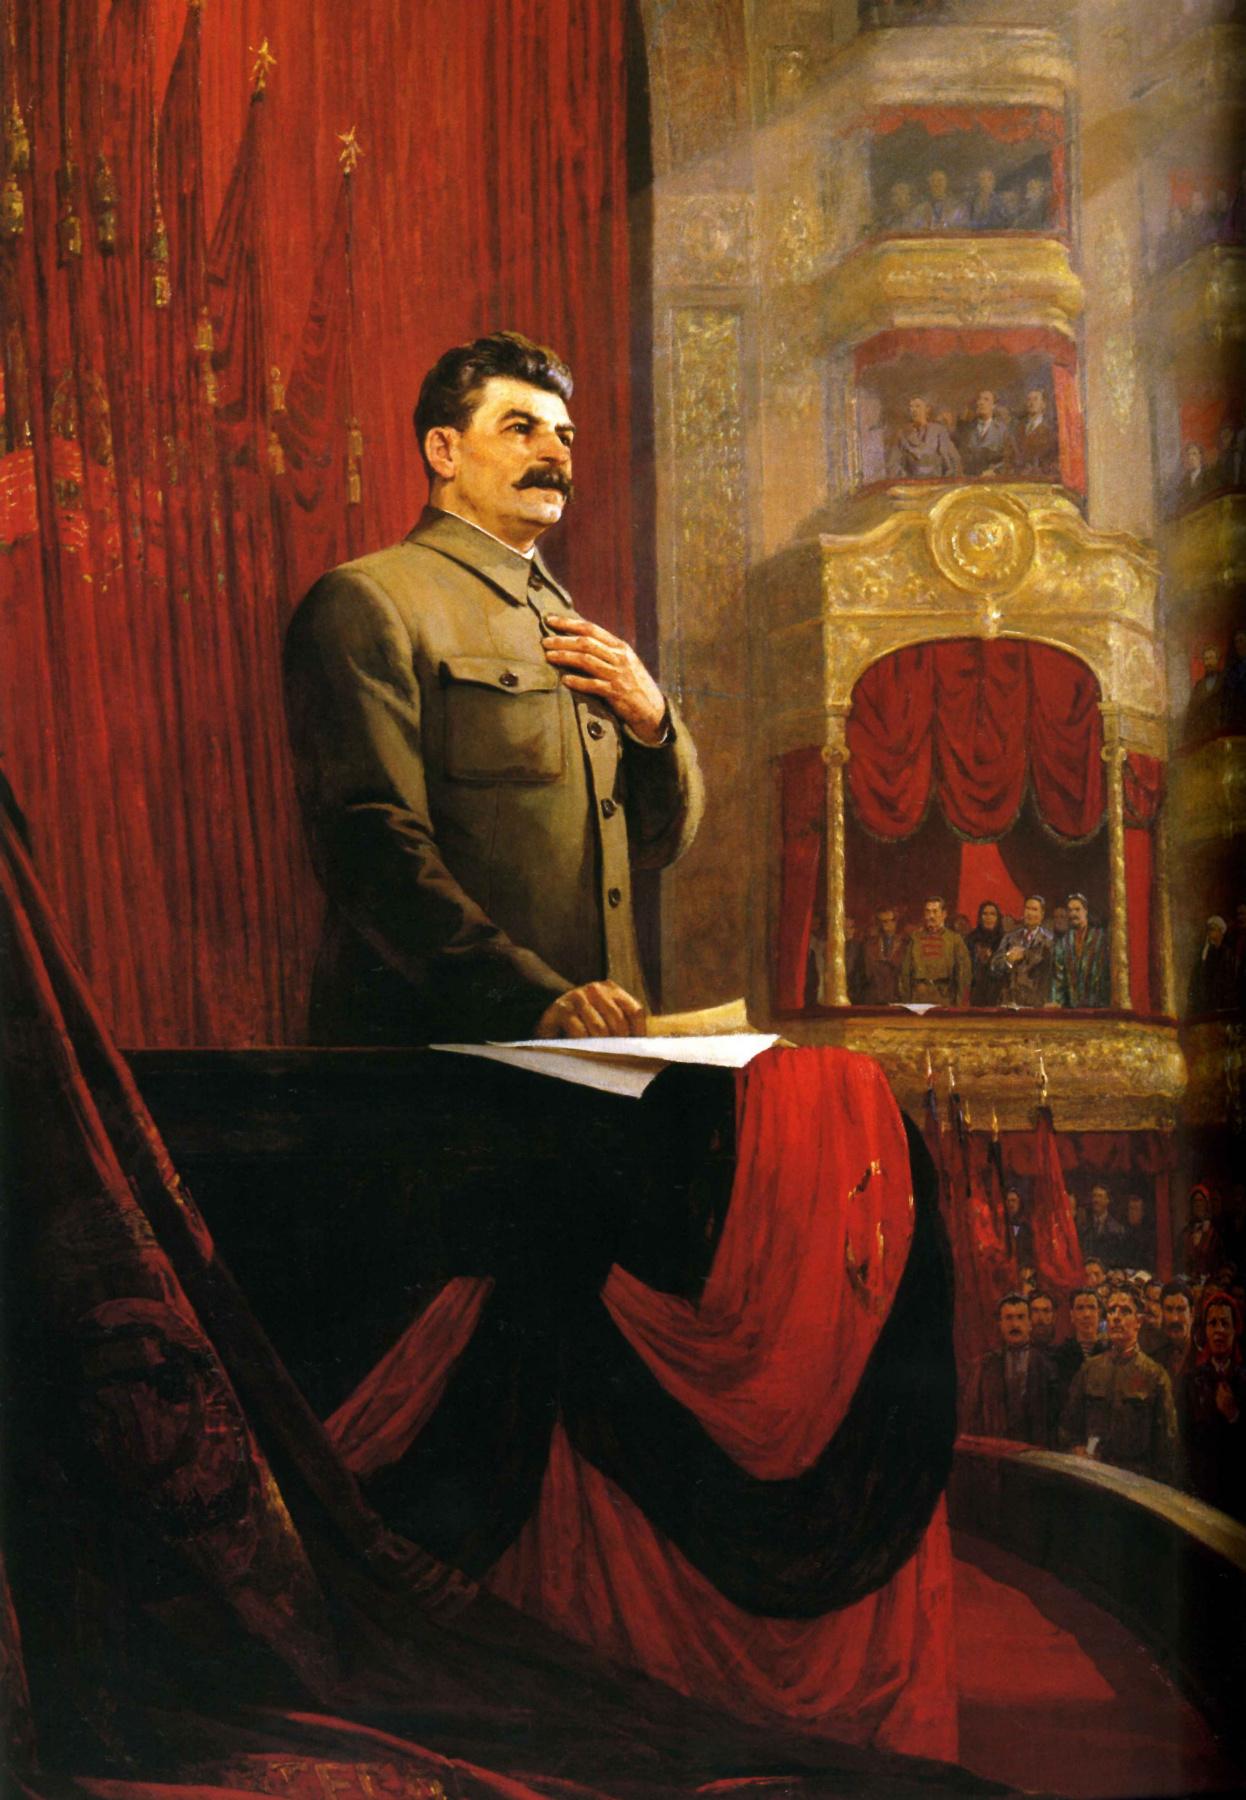 Fedor Pavlovich Reshetnikov. The great oath (Stalin's Speech at the II all-Russian Congress of Soviets on 26 January 1924)